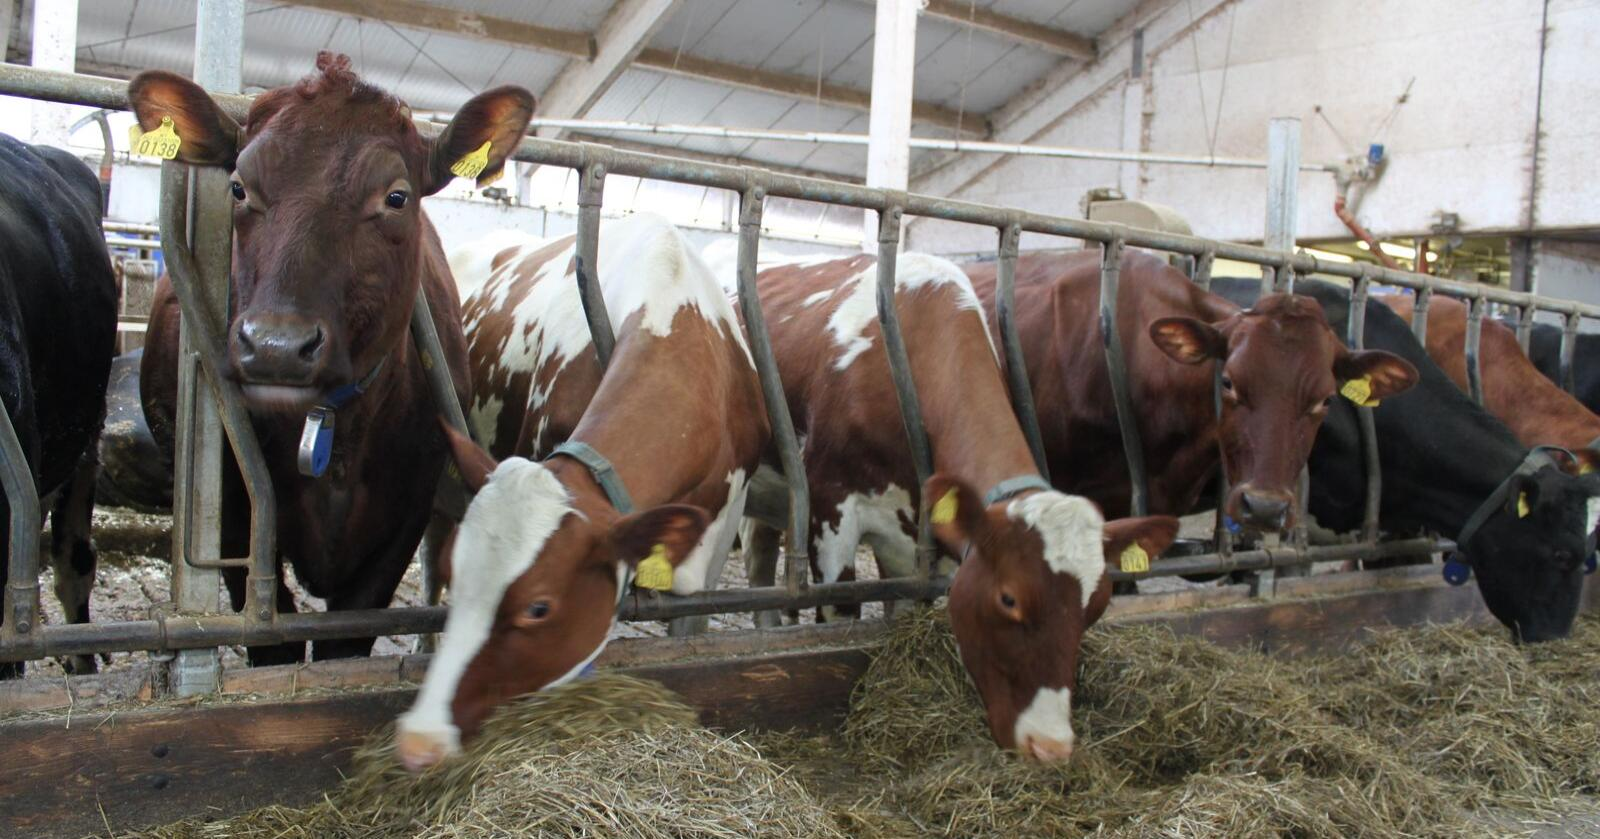 Grovfôr: Smittestoffer ble i helt minimal grad introdusert i norske husdyrbesetninger som følge av den rekordstore grovfôrimporten til Norge i 2018. (Arkivfoto)